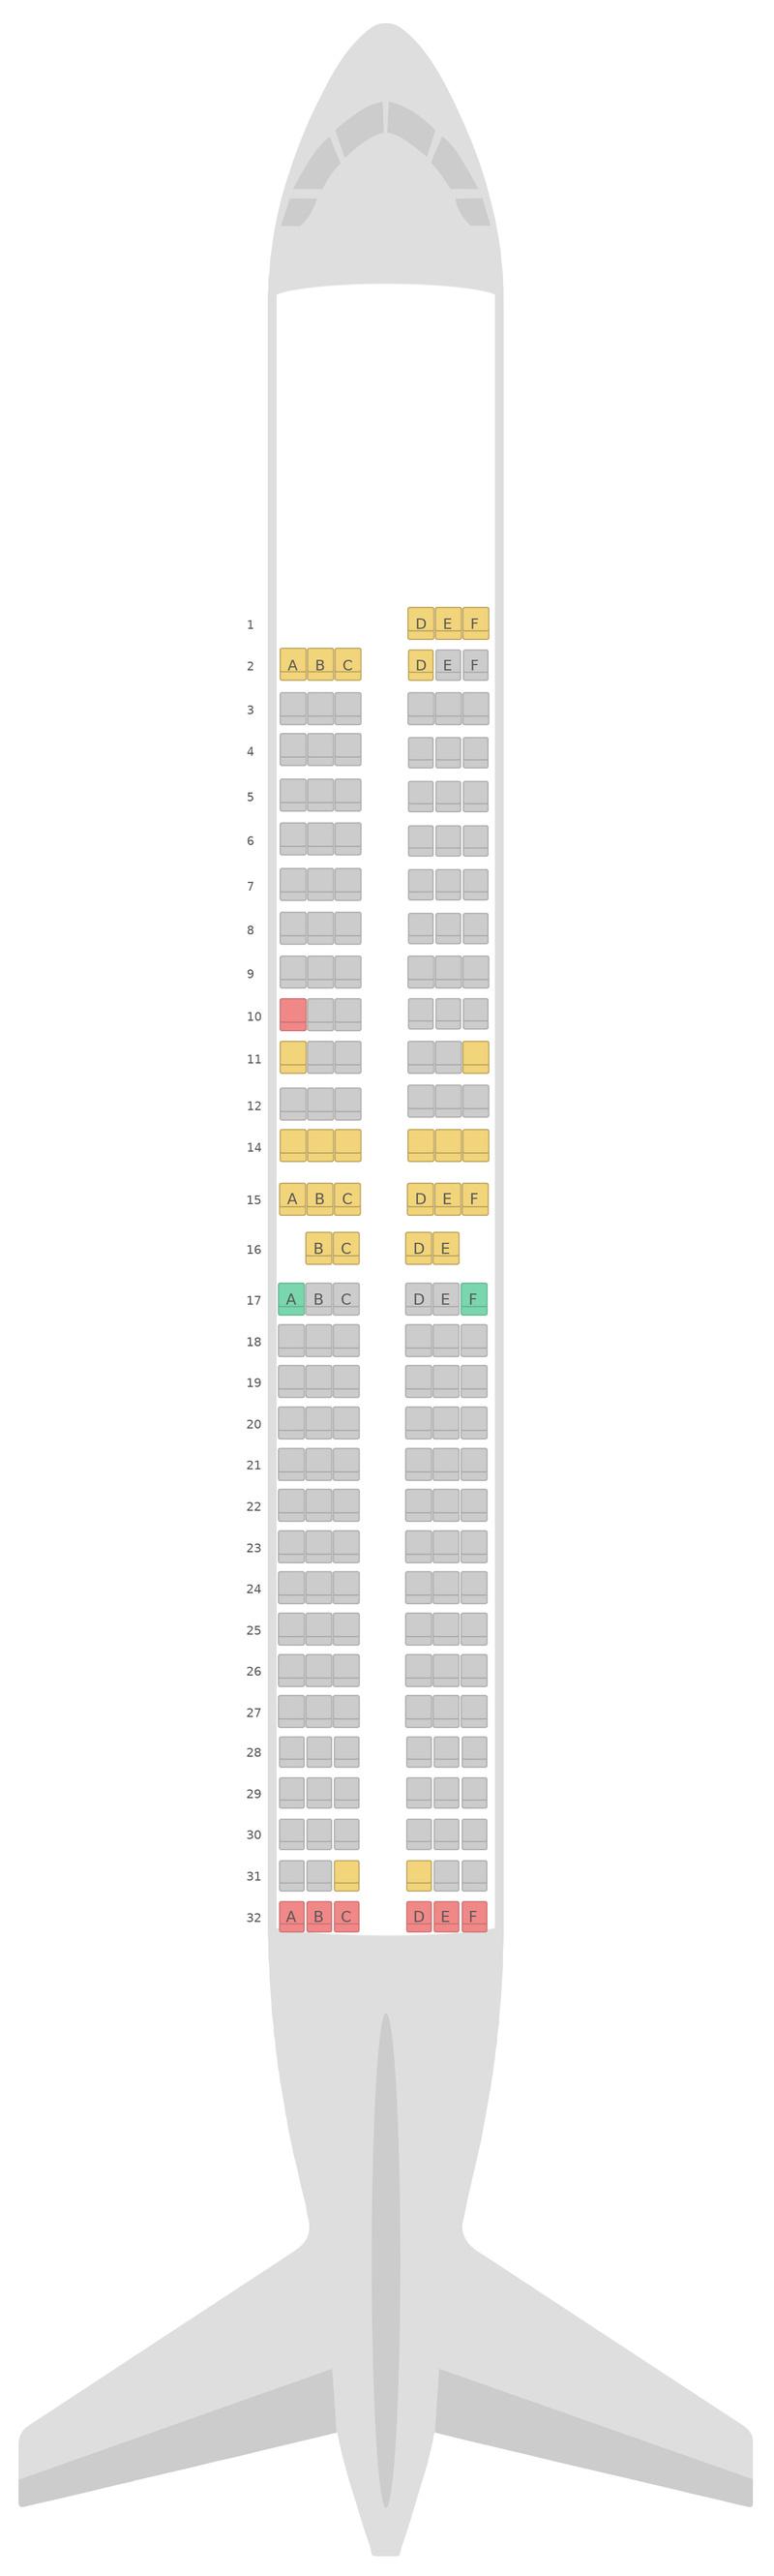 Mapa de asientos Boeing 737-800 (738) Scandinavian Airlines (SAS)